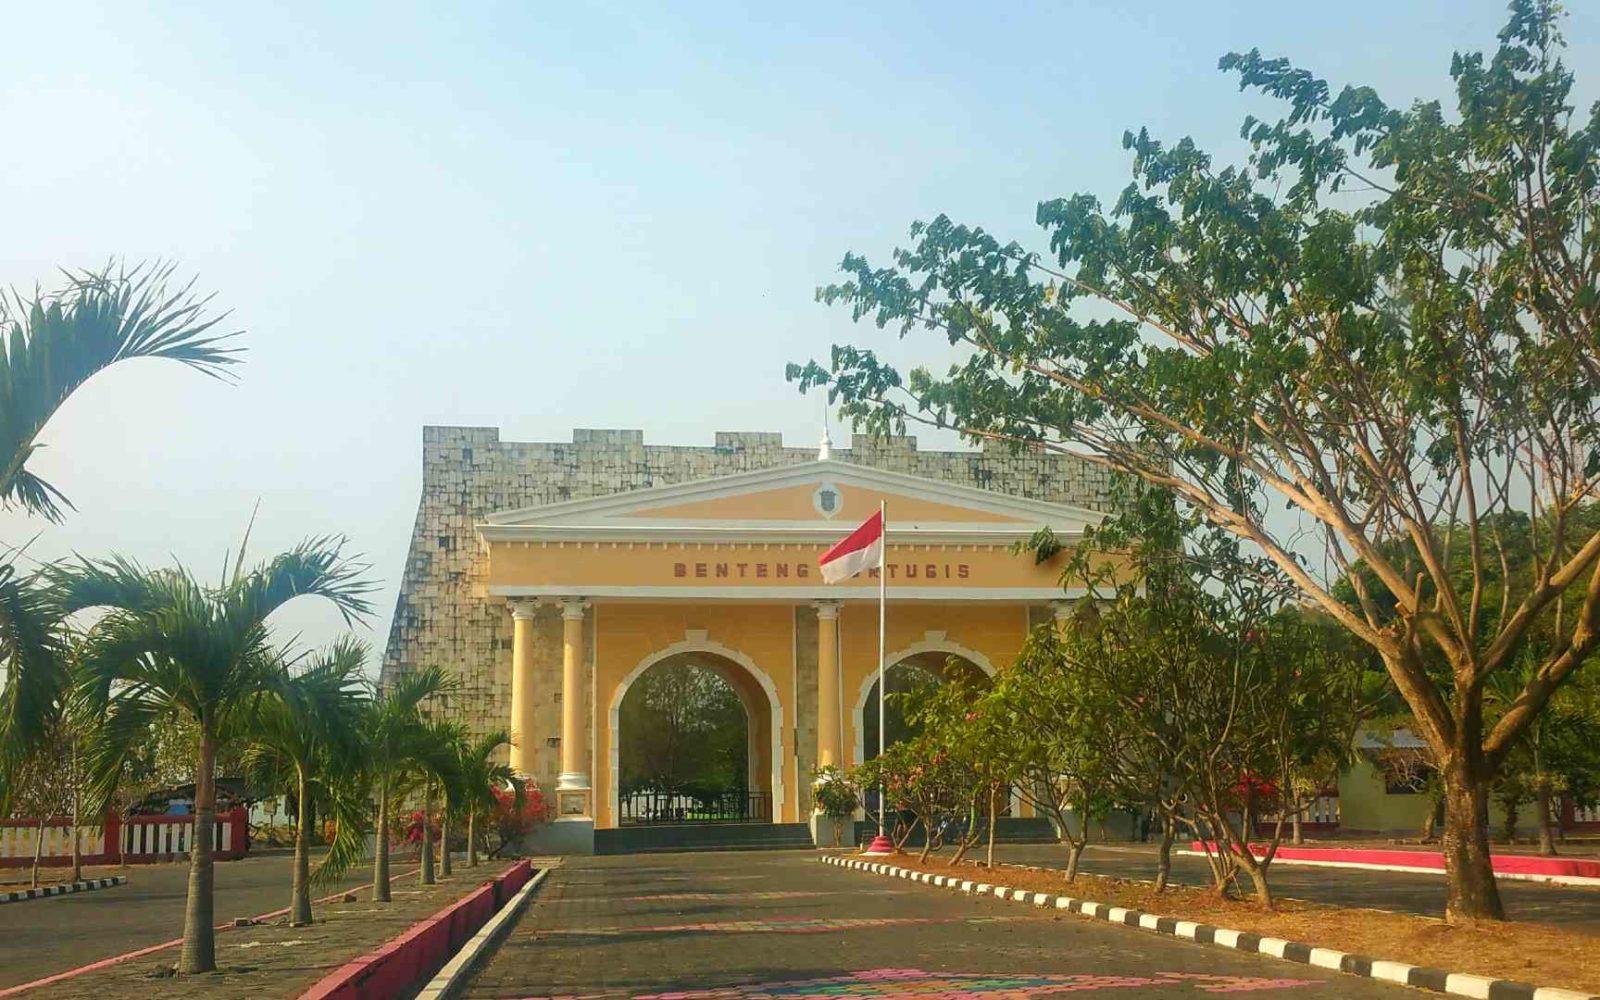 Wisata Sejarah Benteng Portugis Jepara April 2021 Travelspromo